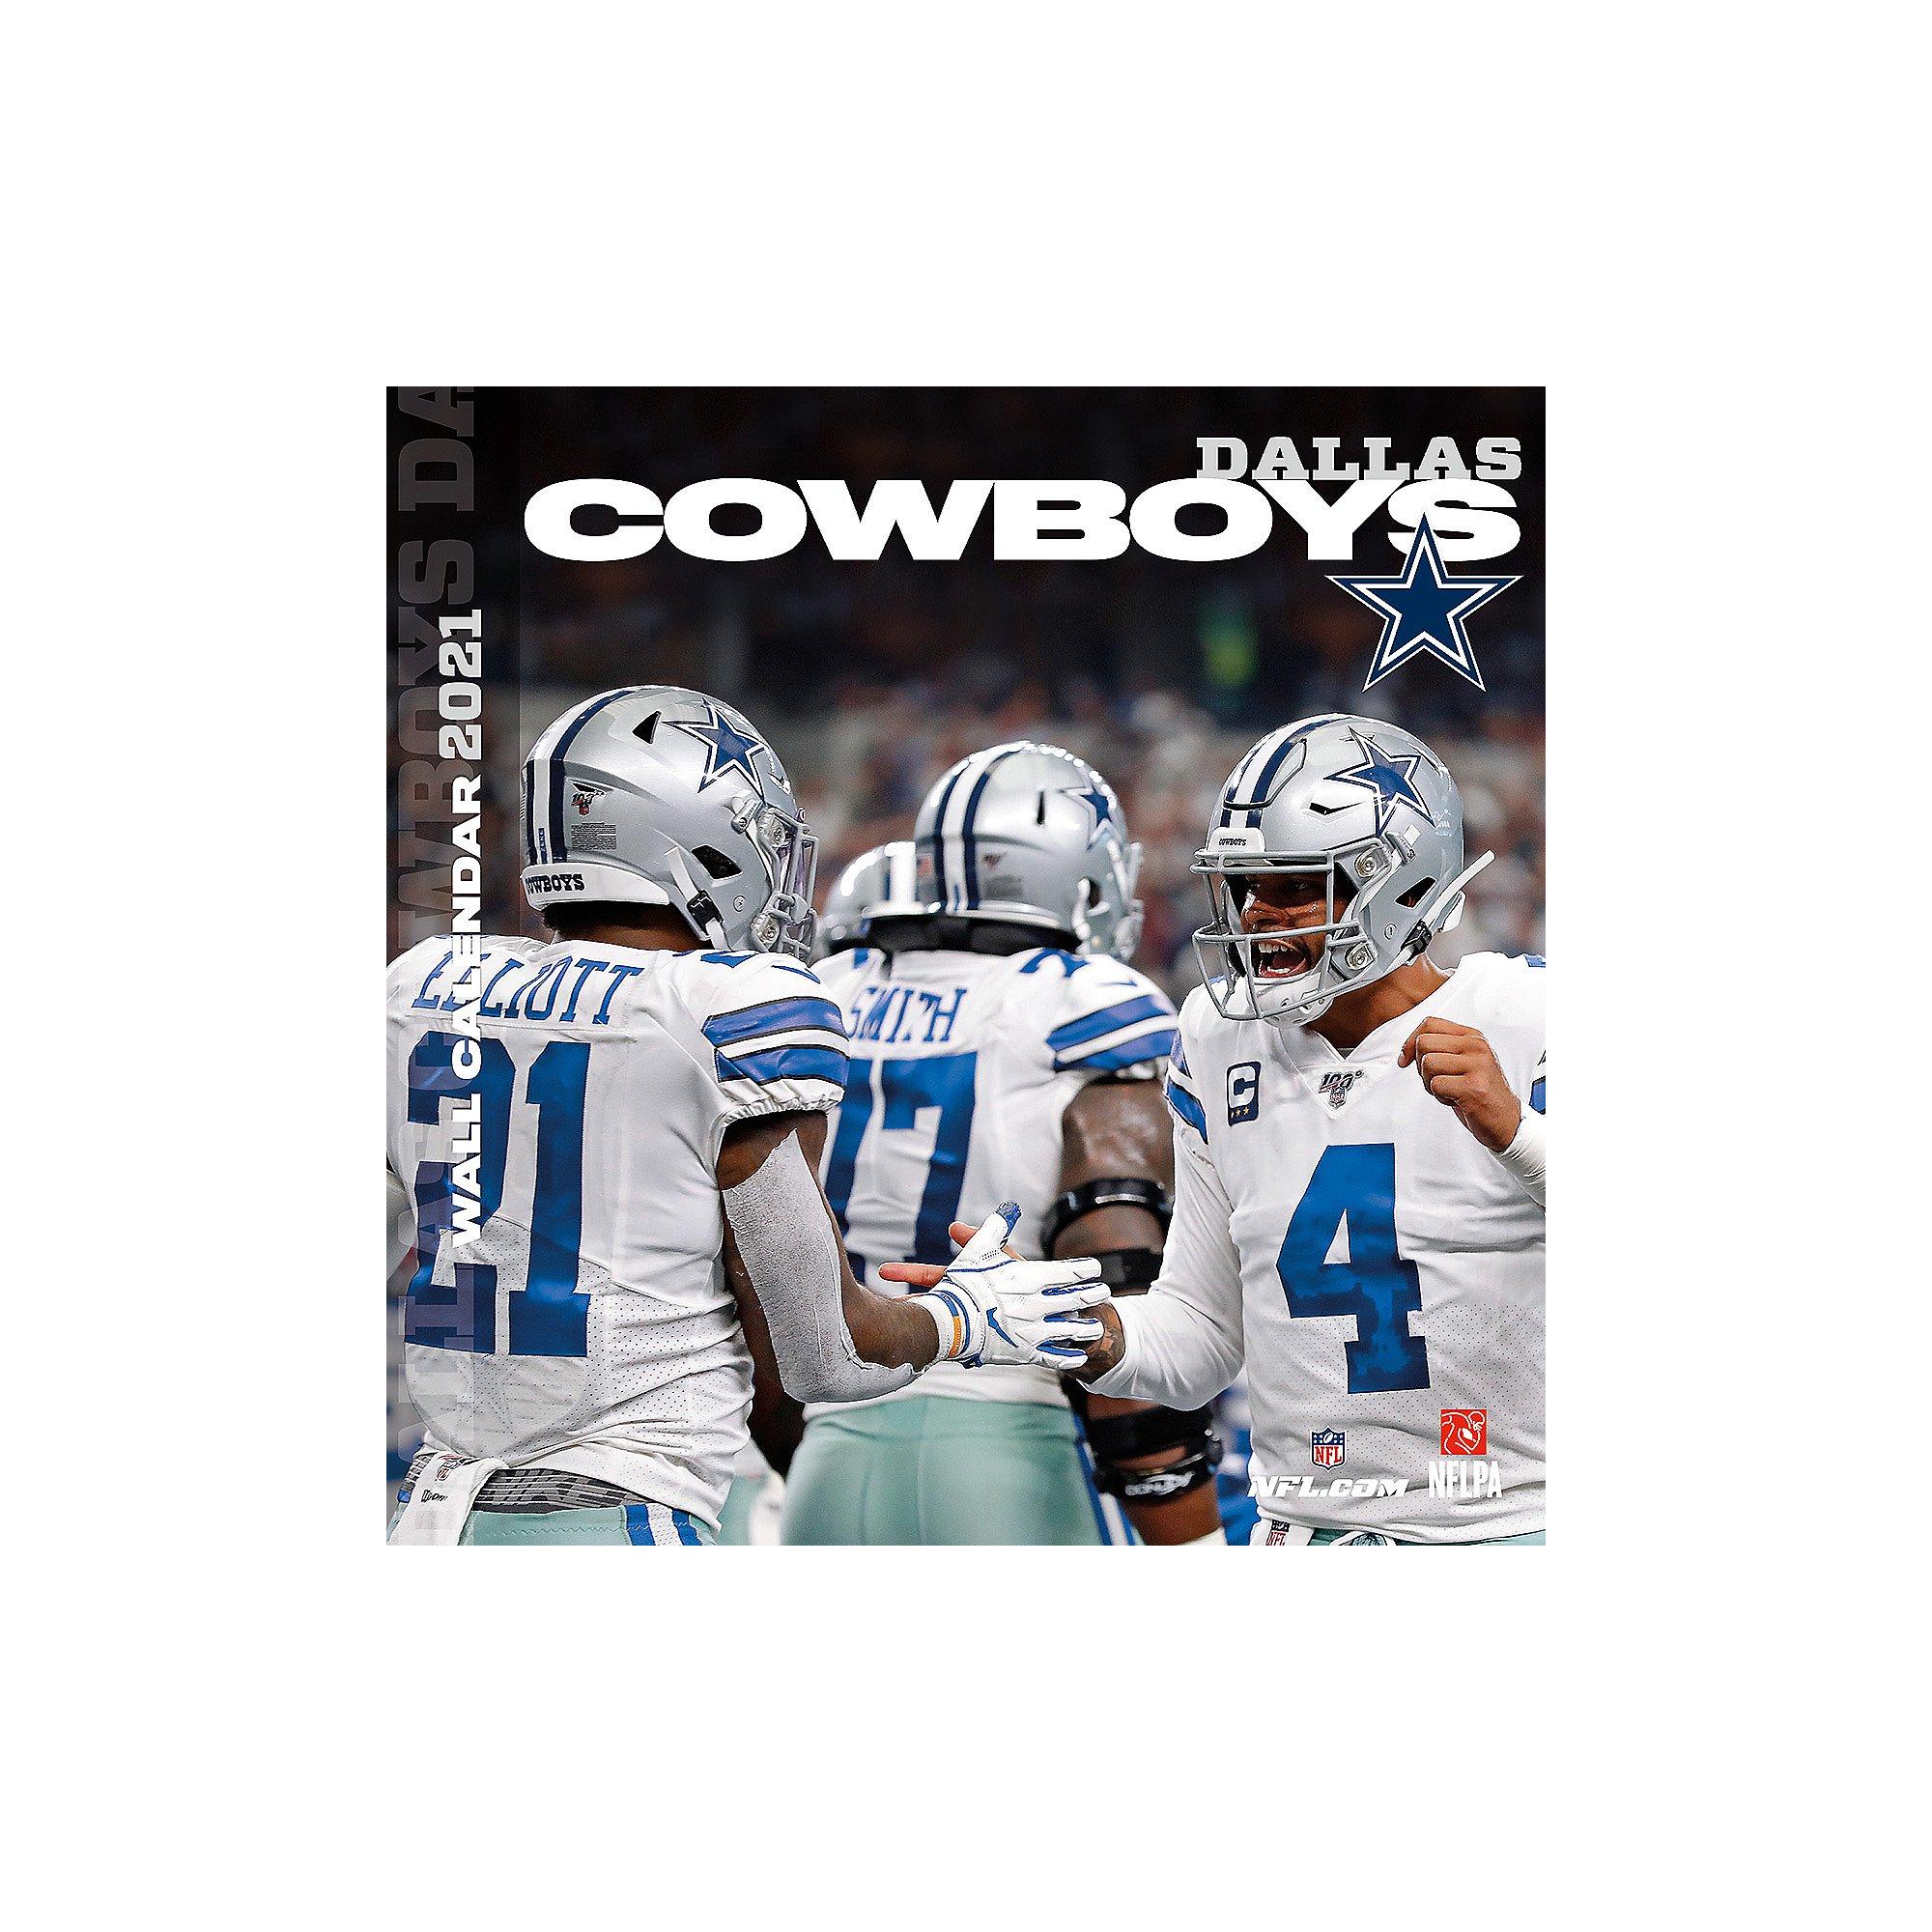 2021 12x12 Dallas Cowboys Team Wall Calendar